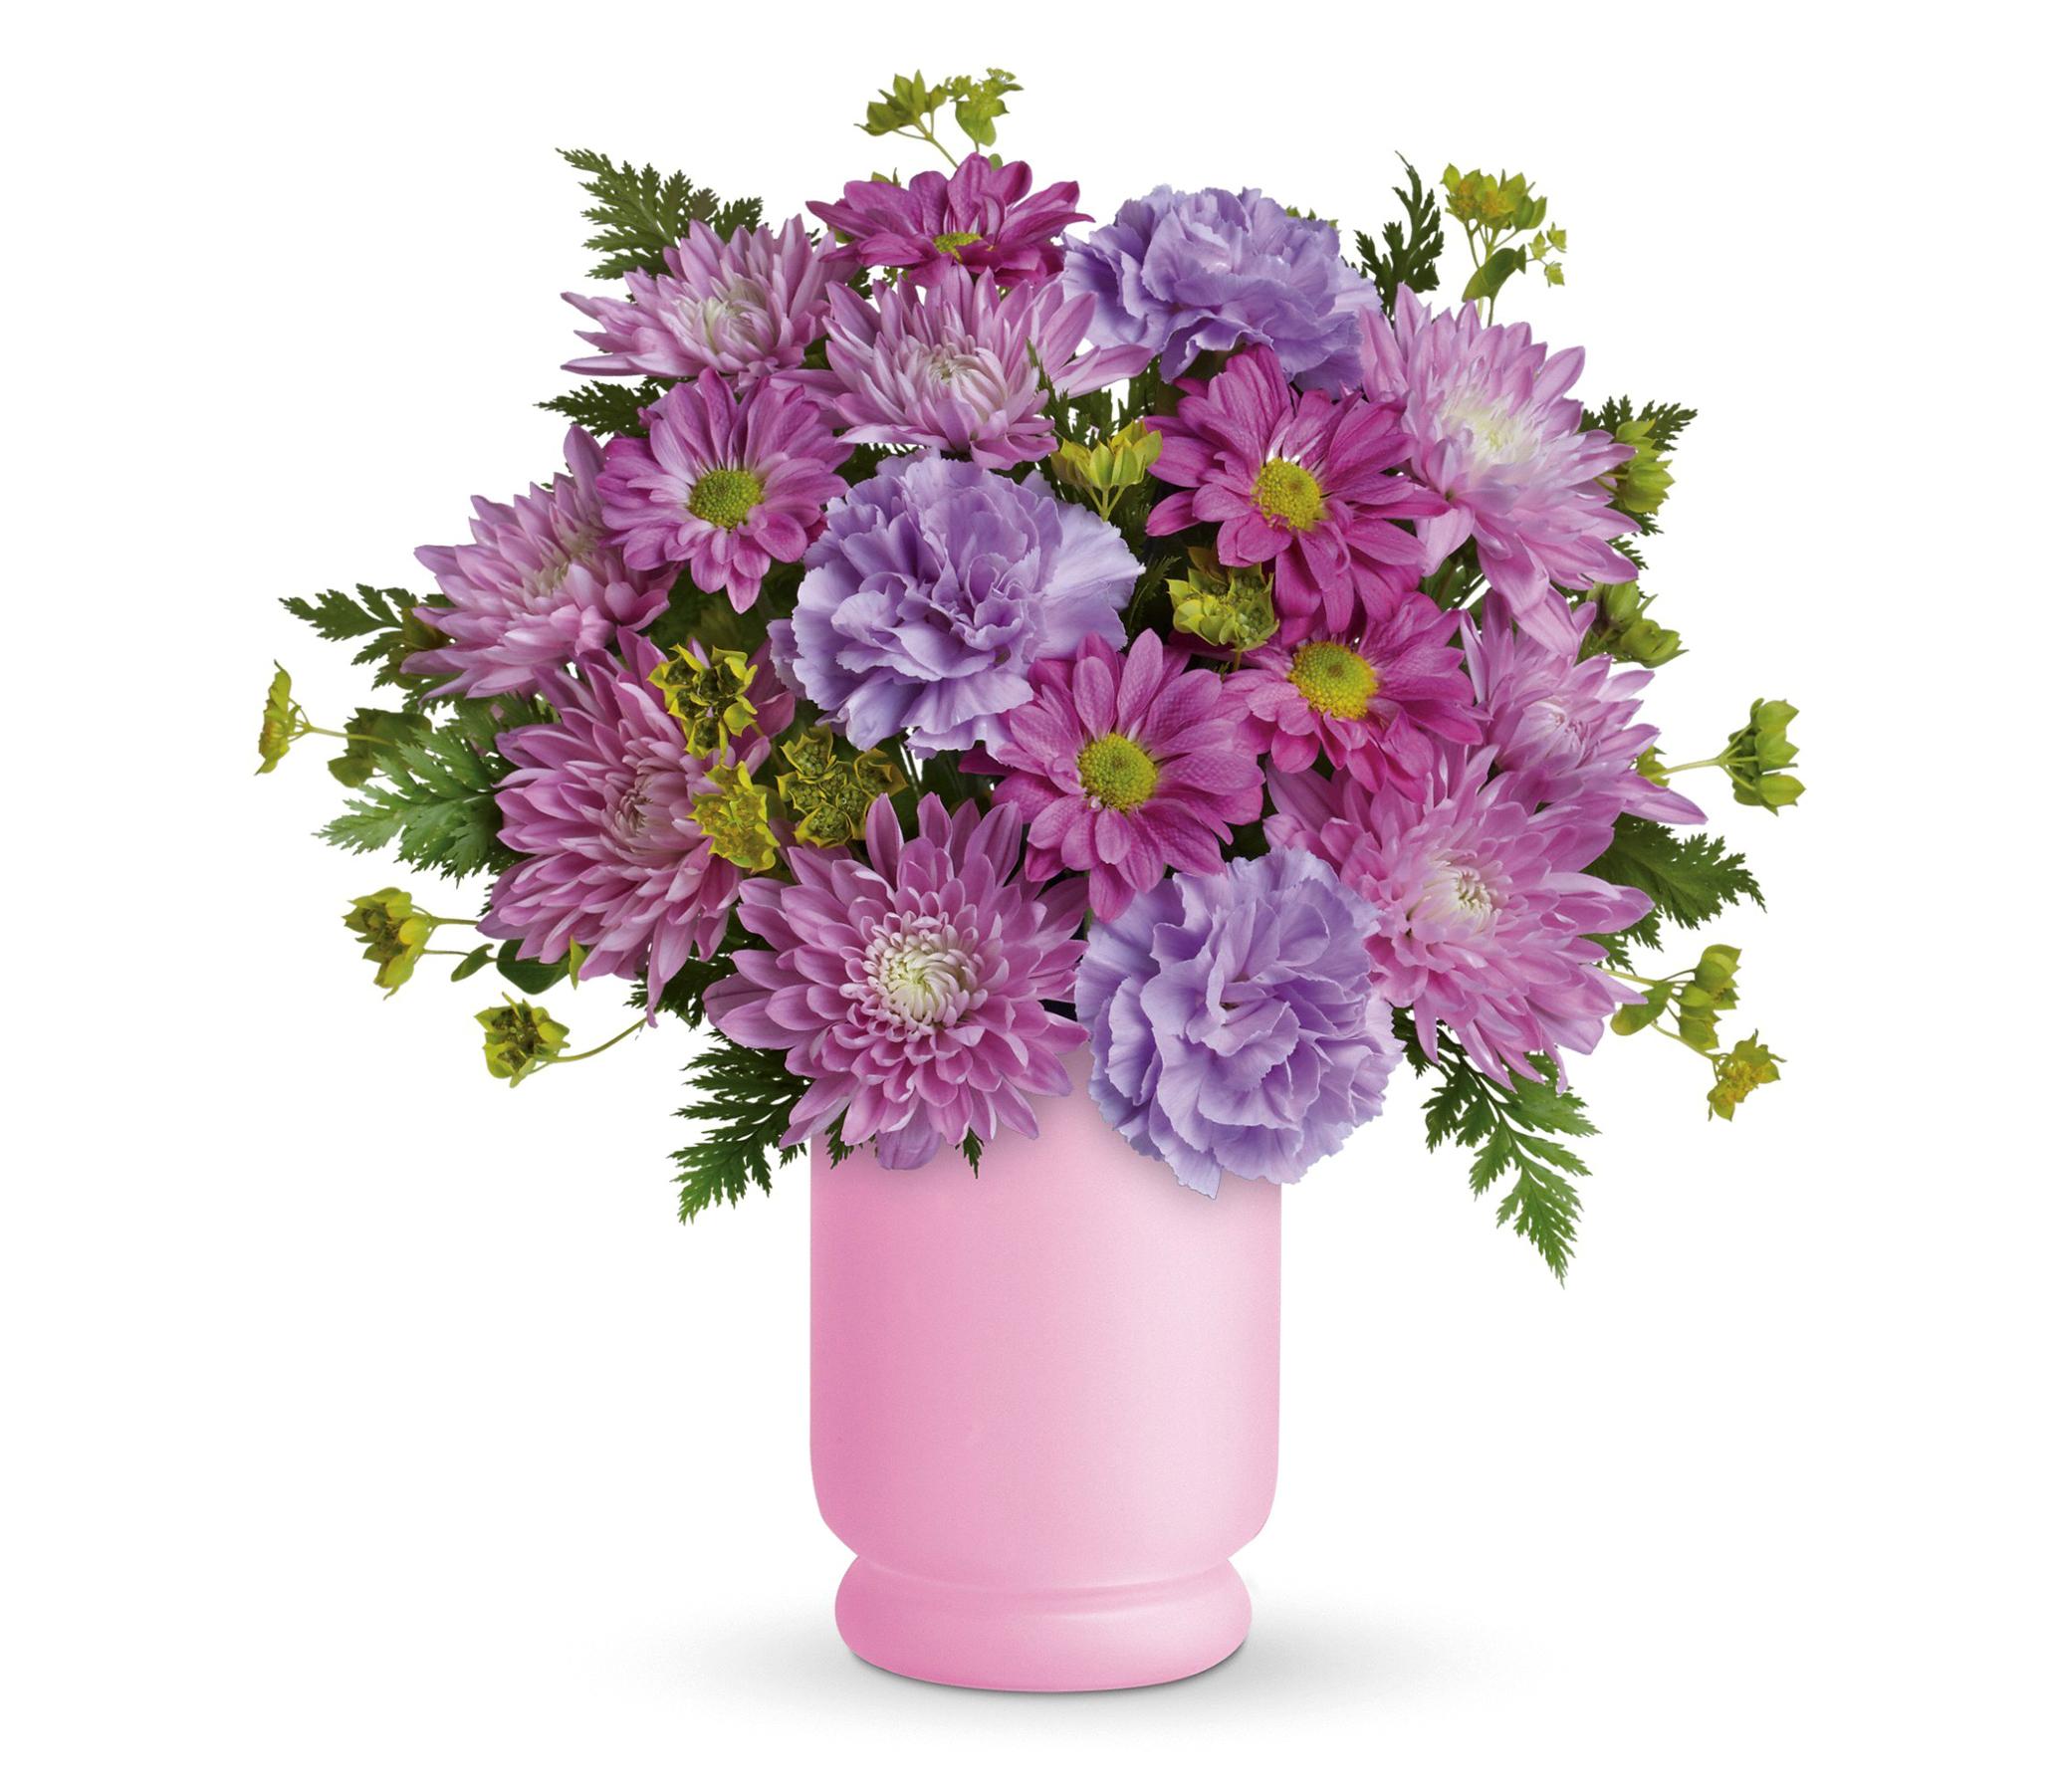 Purple Flower Bouquet HD Wallpaper | Background Image